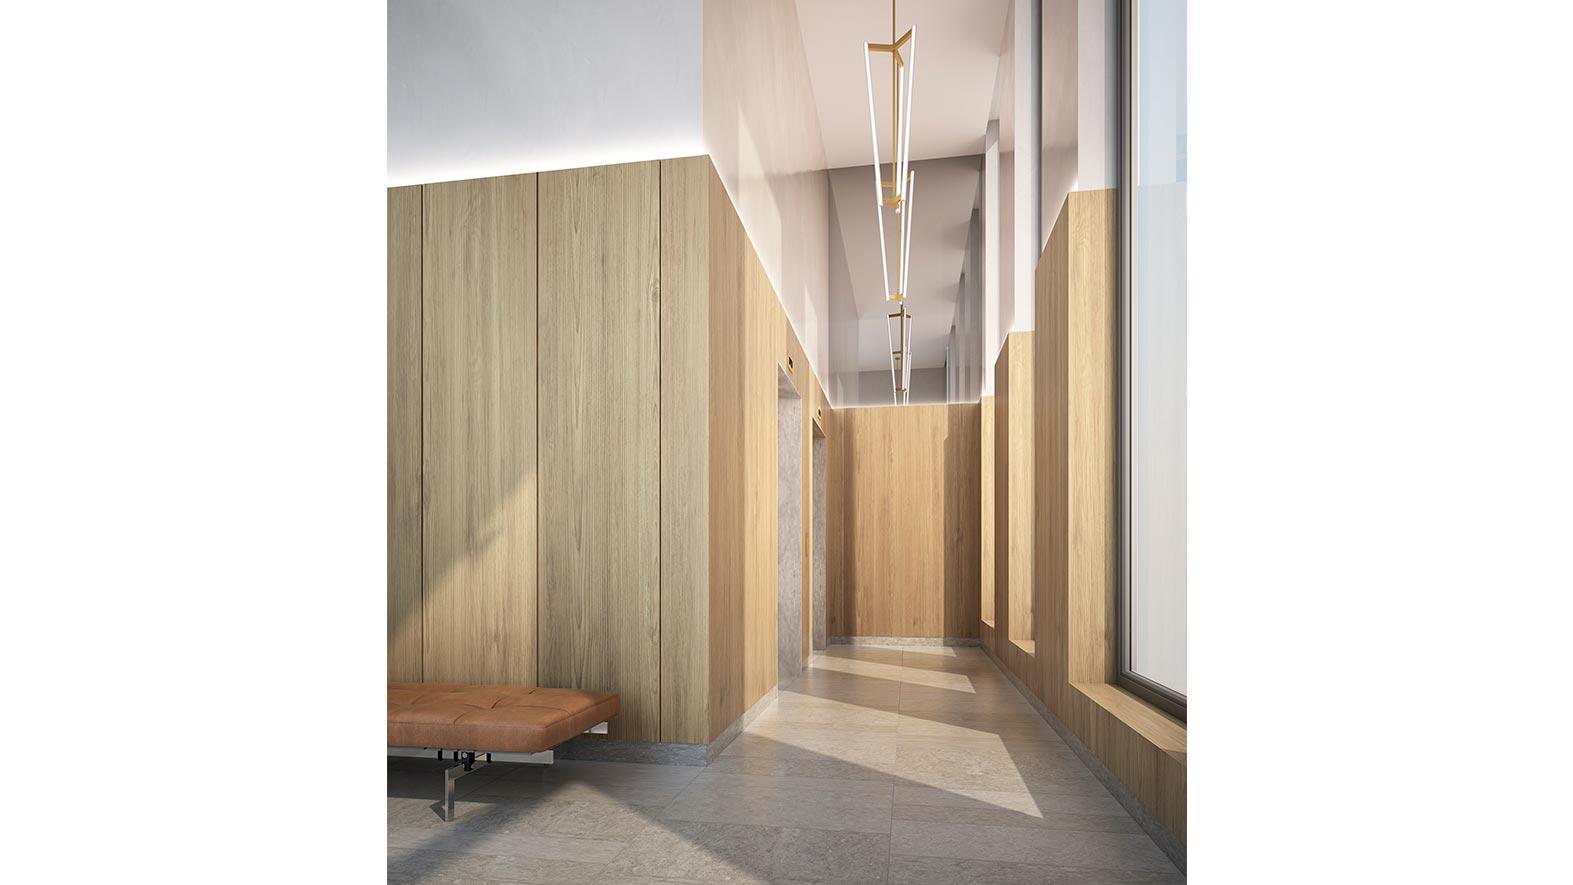 stockholm-most-expensive-apartment-lauren-blog-7.jpg